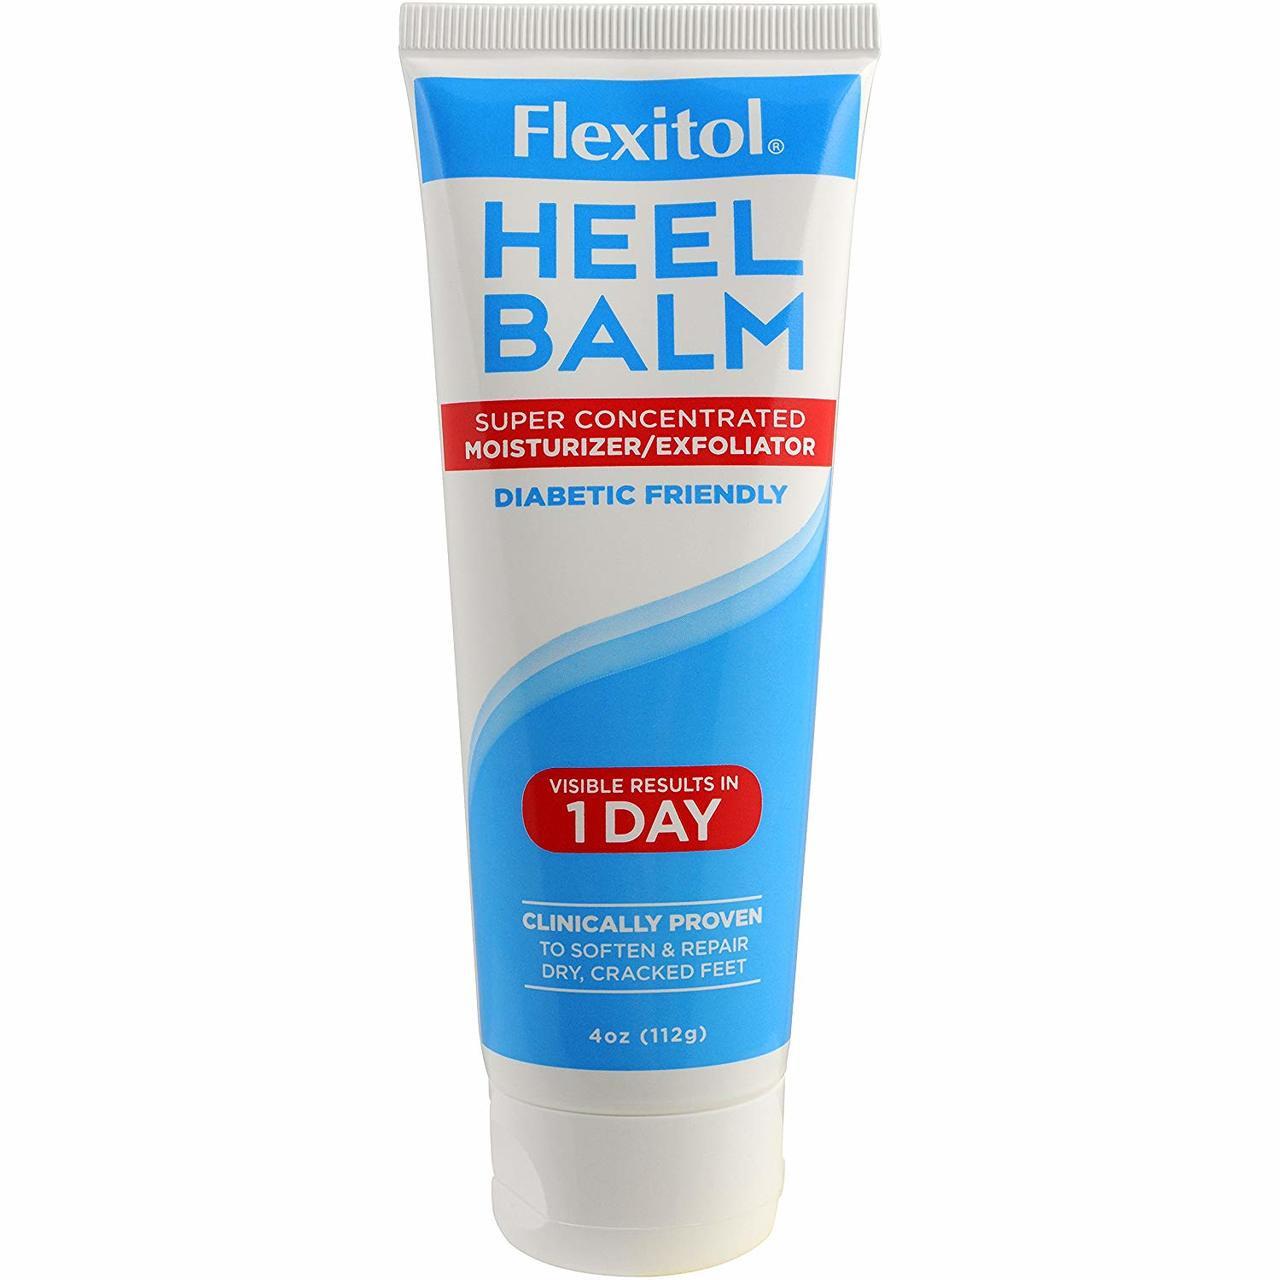 Flexitol Heel Balm 4 Oz Tube Rich Moisturizing Exfoliating Foot